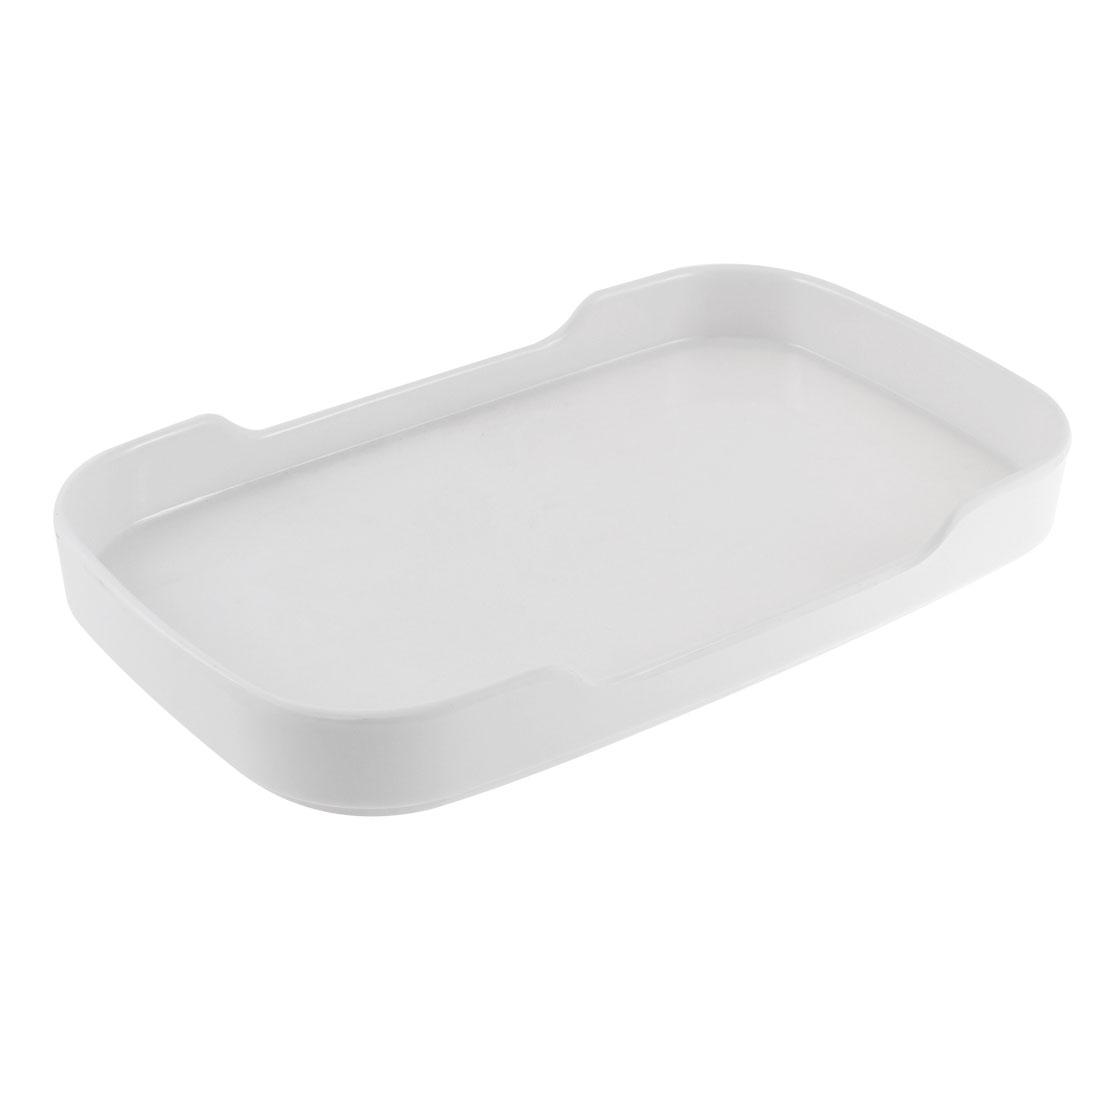 Buffet Hot Pot Plastic Rectangle Shaped Tray Dish Plate White 8.5''